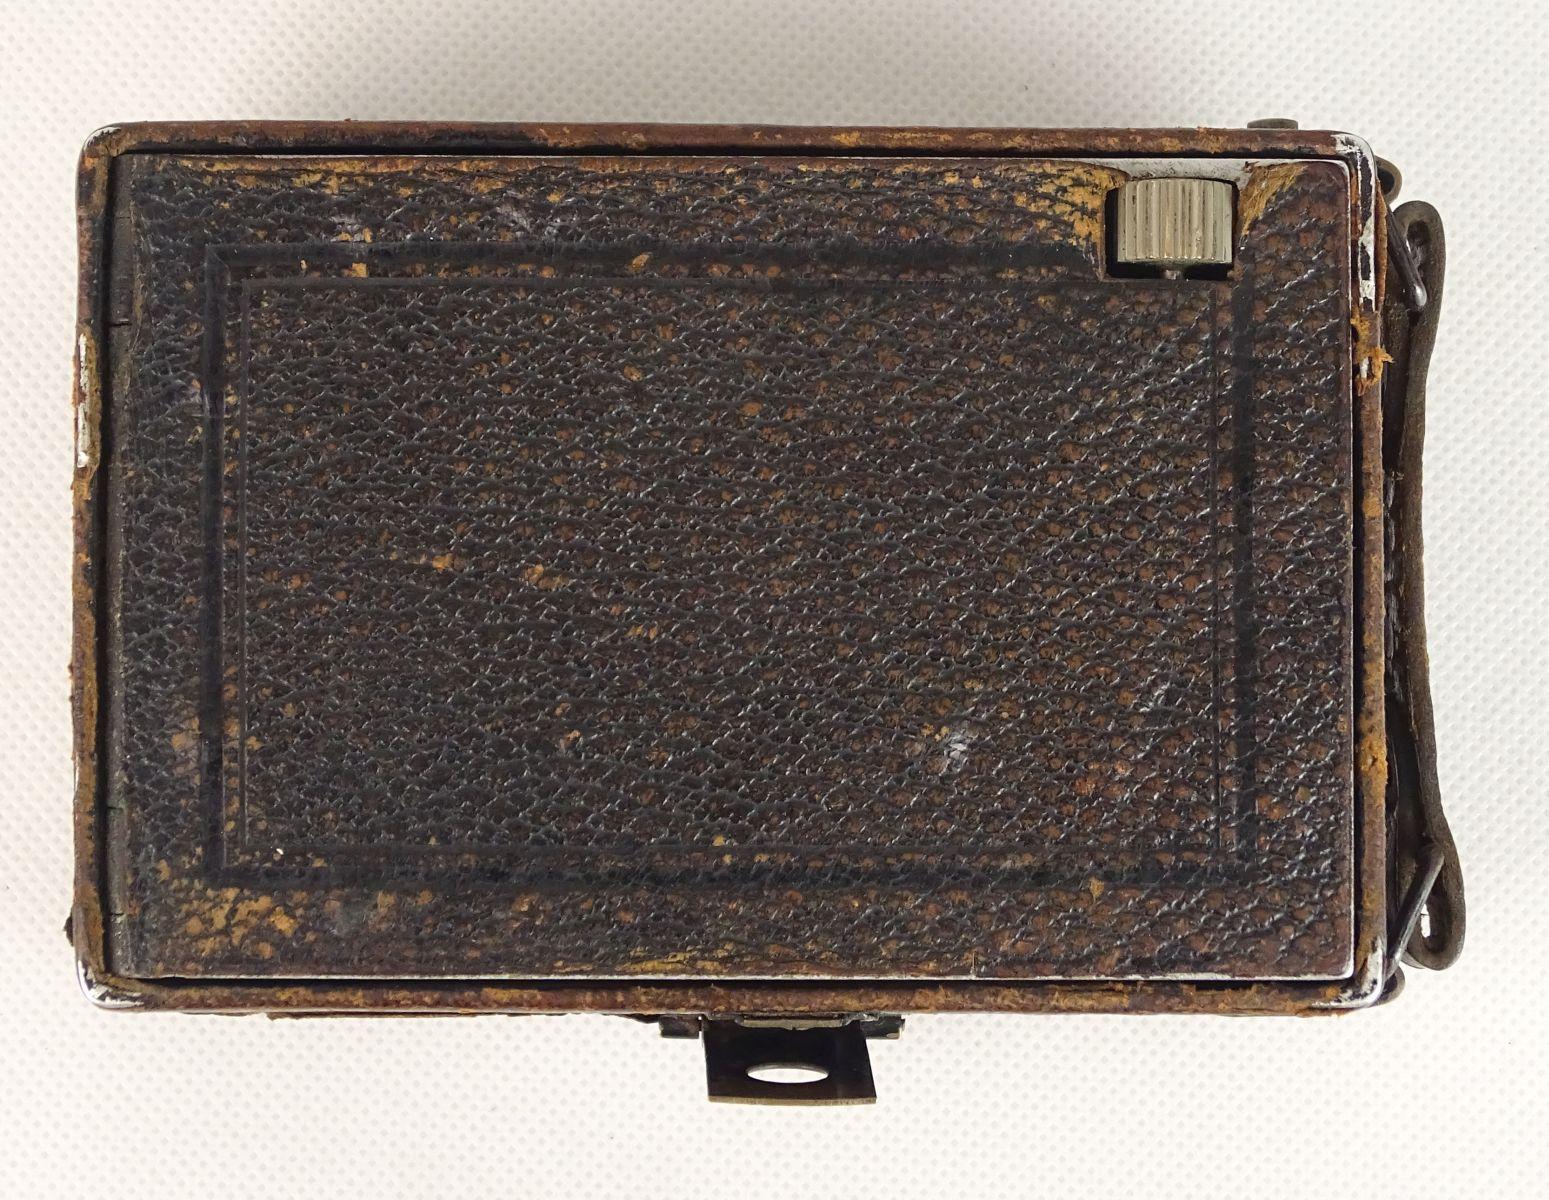 DSC00740.JPG (1549×1200)